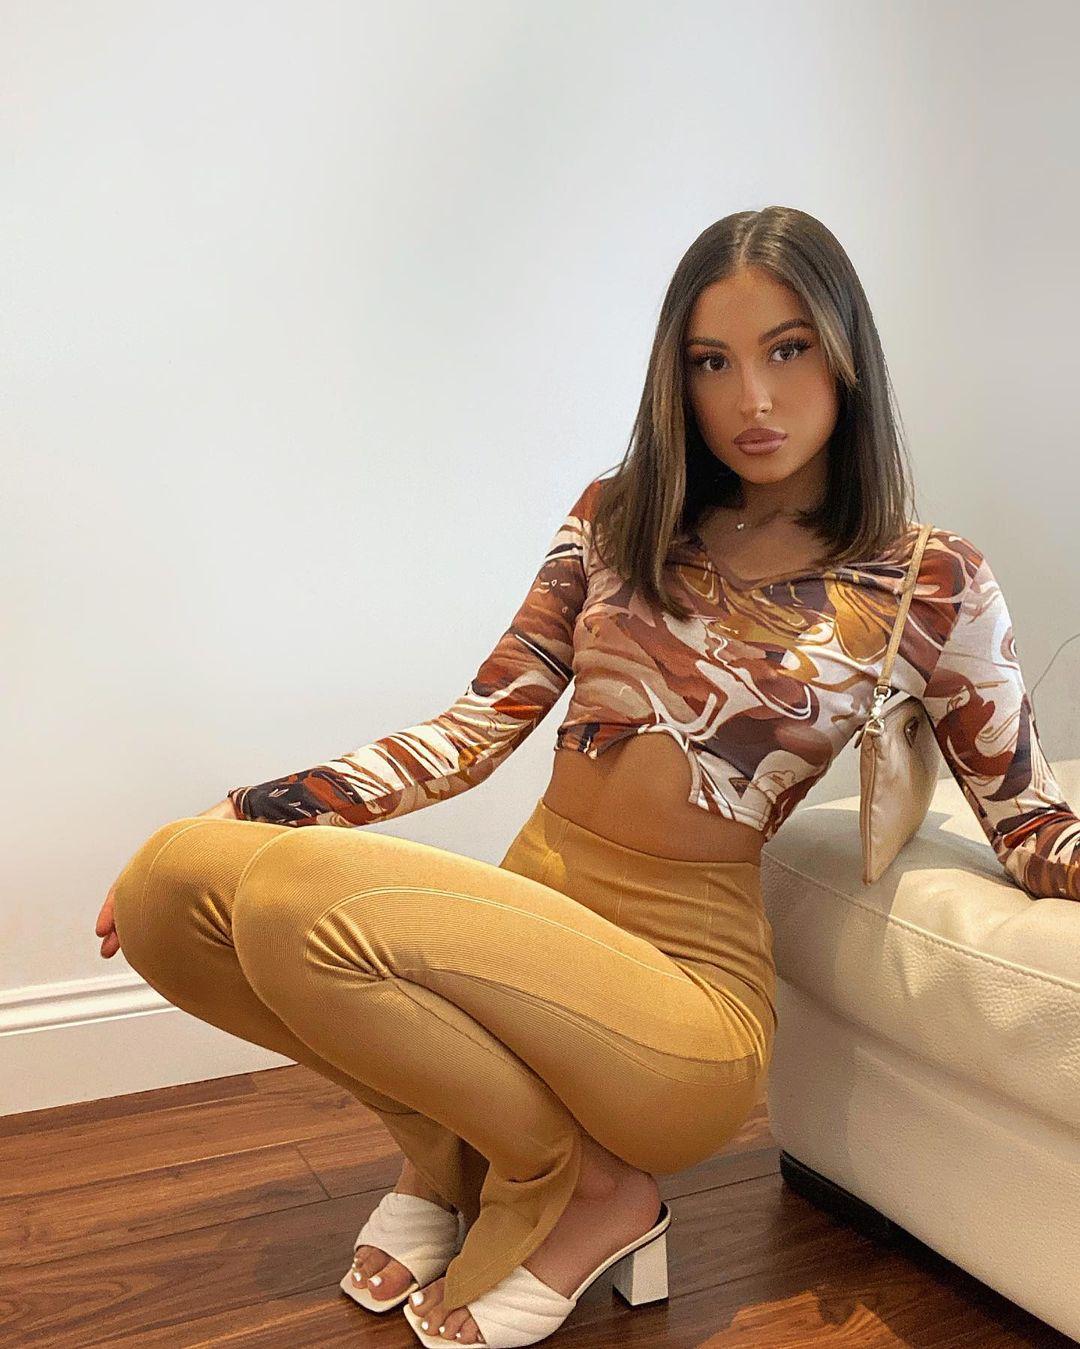 Liana-Marisa-Wallpapers-Insta-Fit-Bio-6